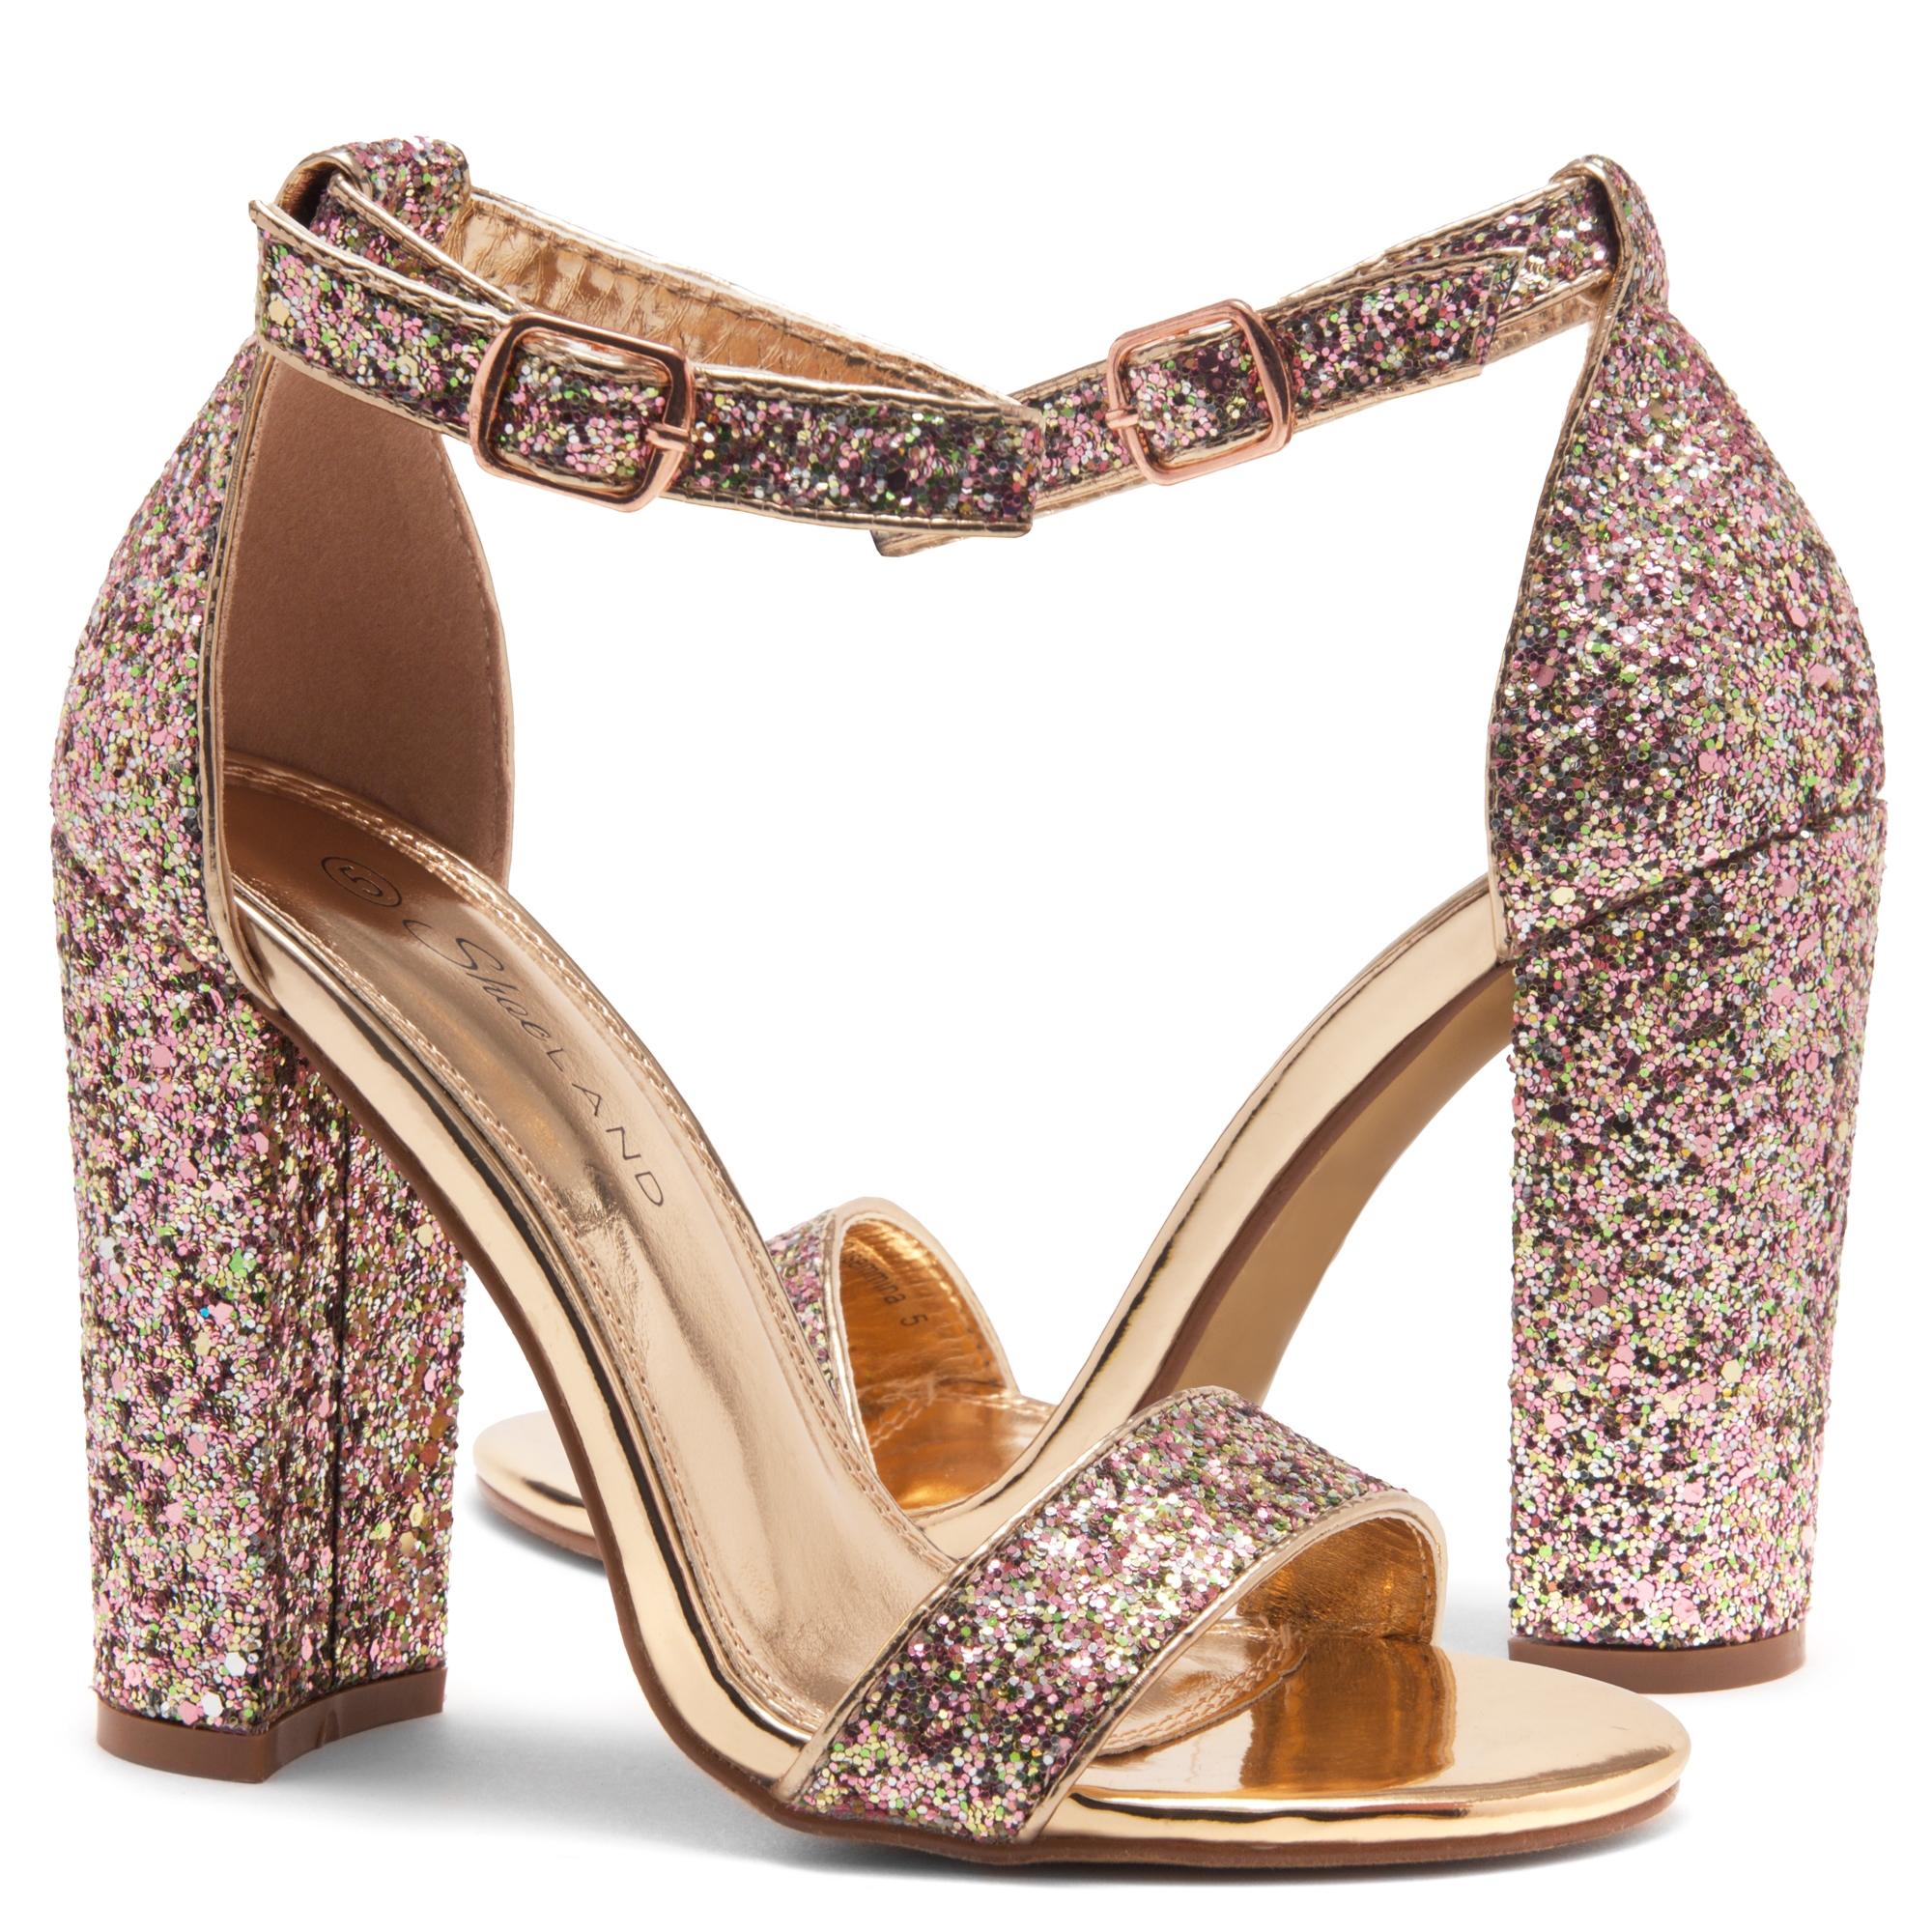 c97854731df9 HerStyle Rosemmina Open Toe Ankle Strap Chunky Heel (RoseGoldGlitter)